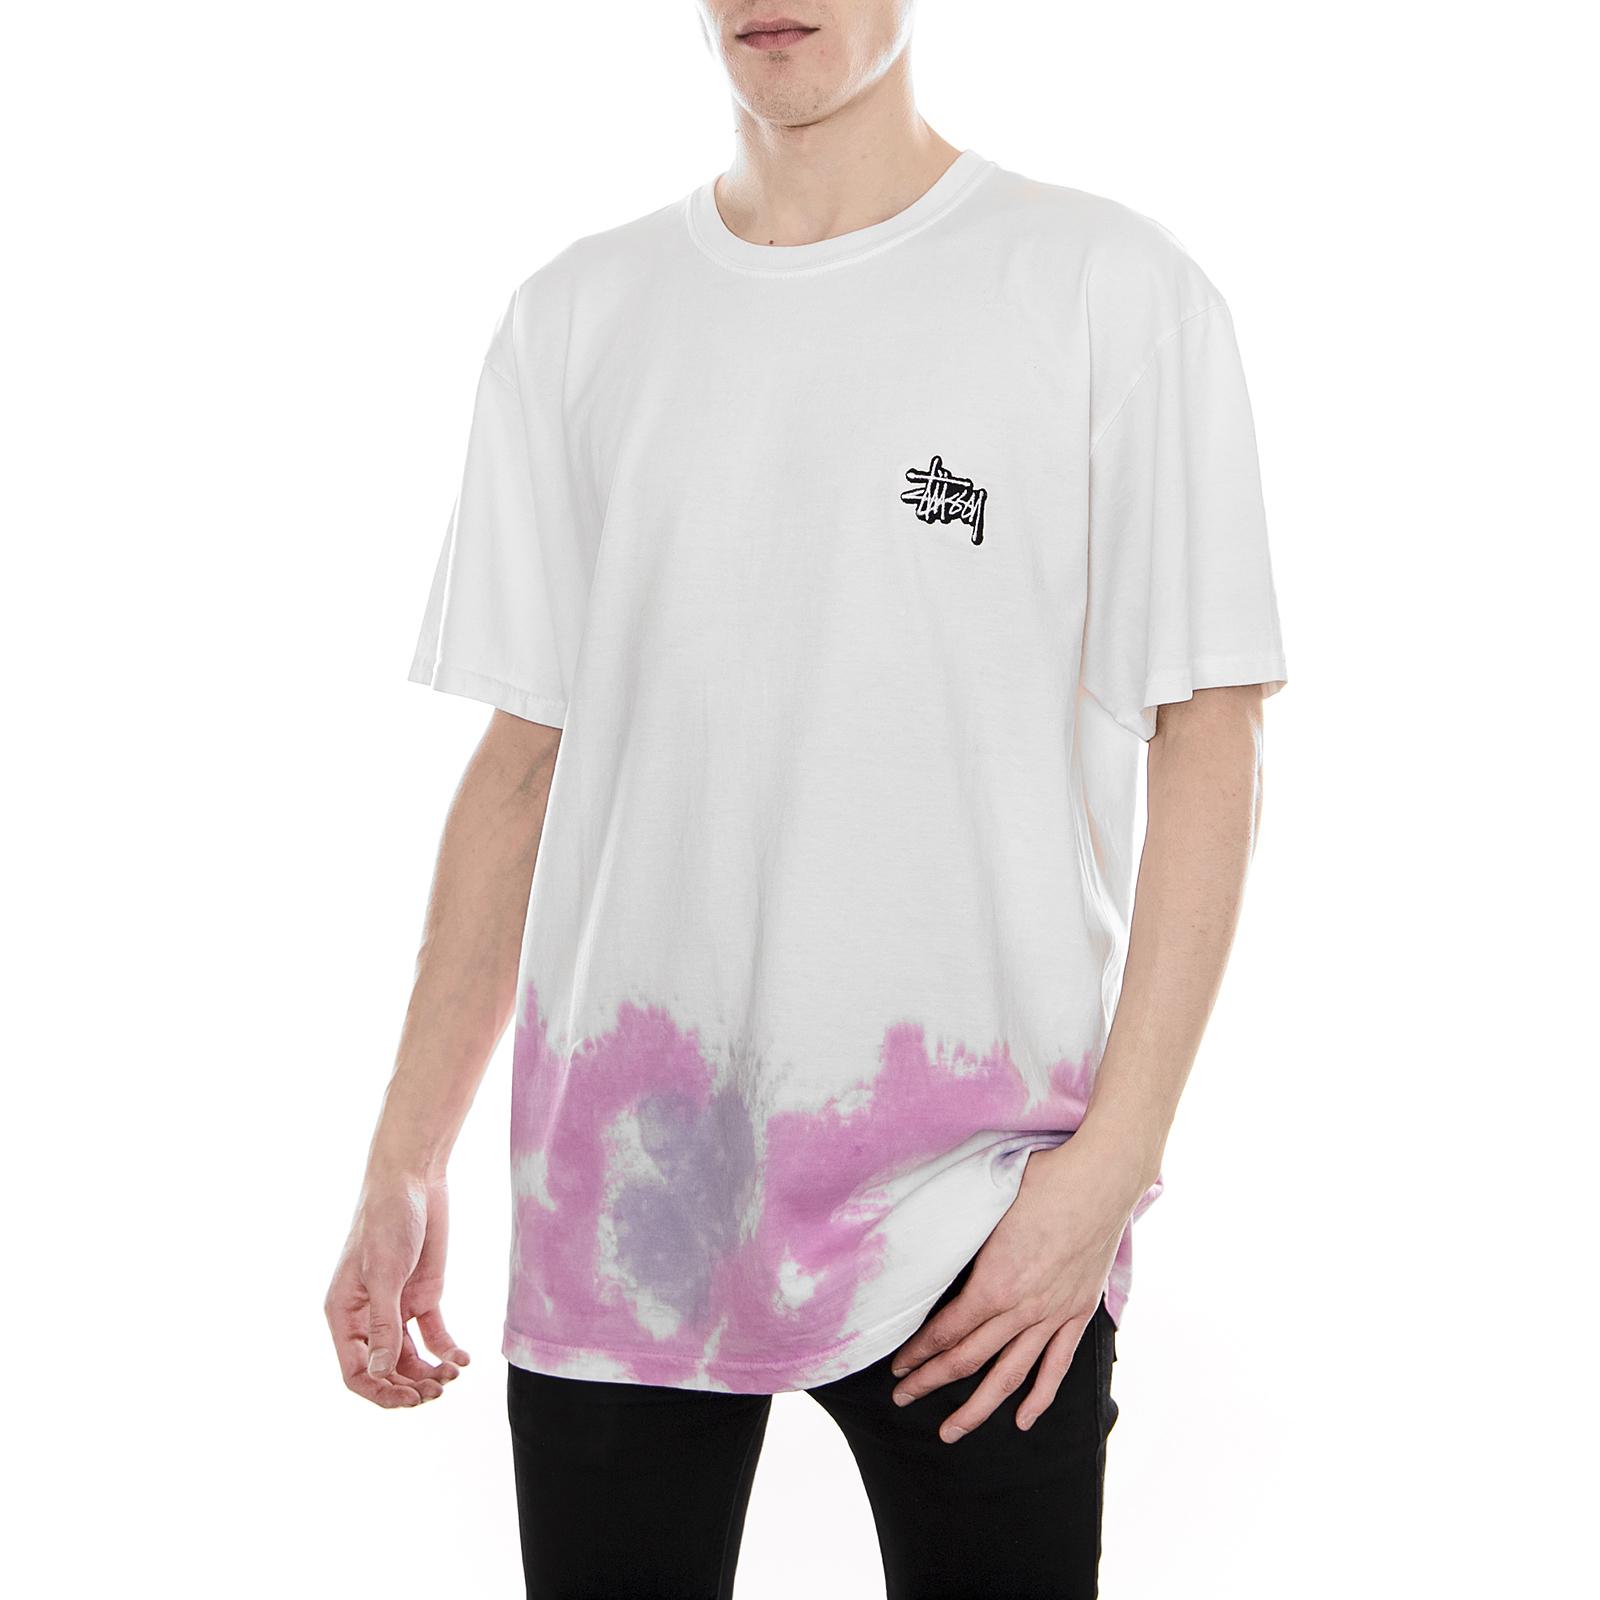 7a16b325b Stussy T-Shirt Stussy Clouds Td Tee Natural White   eBay